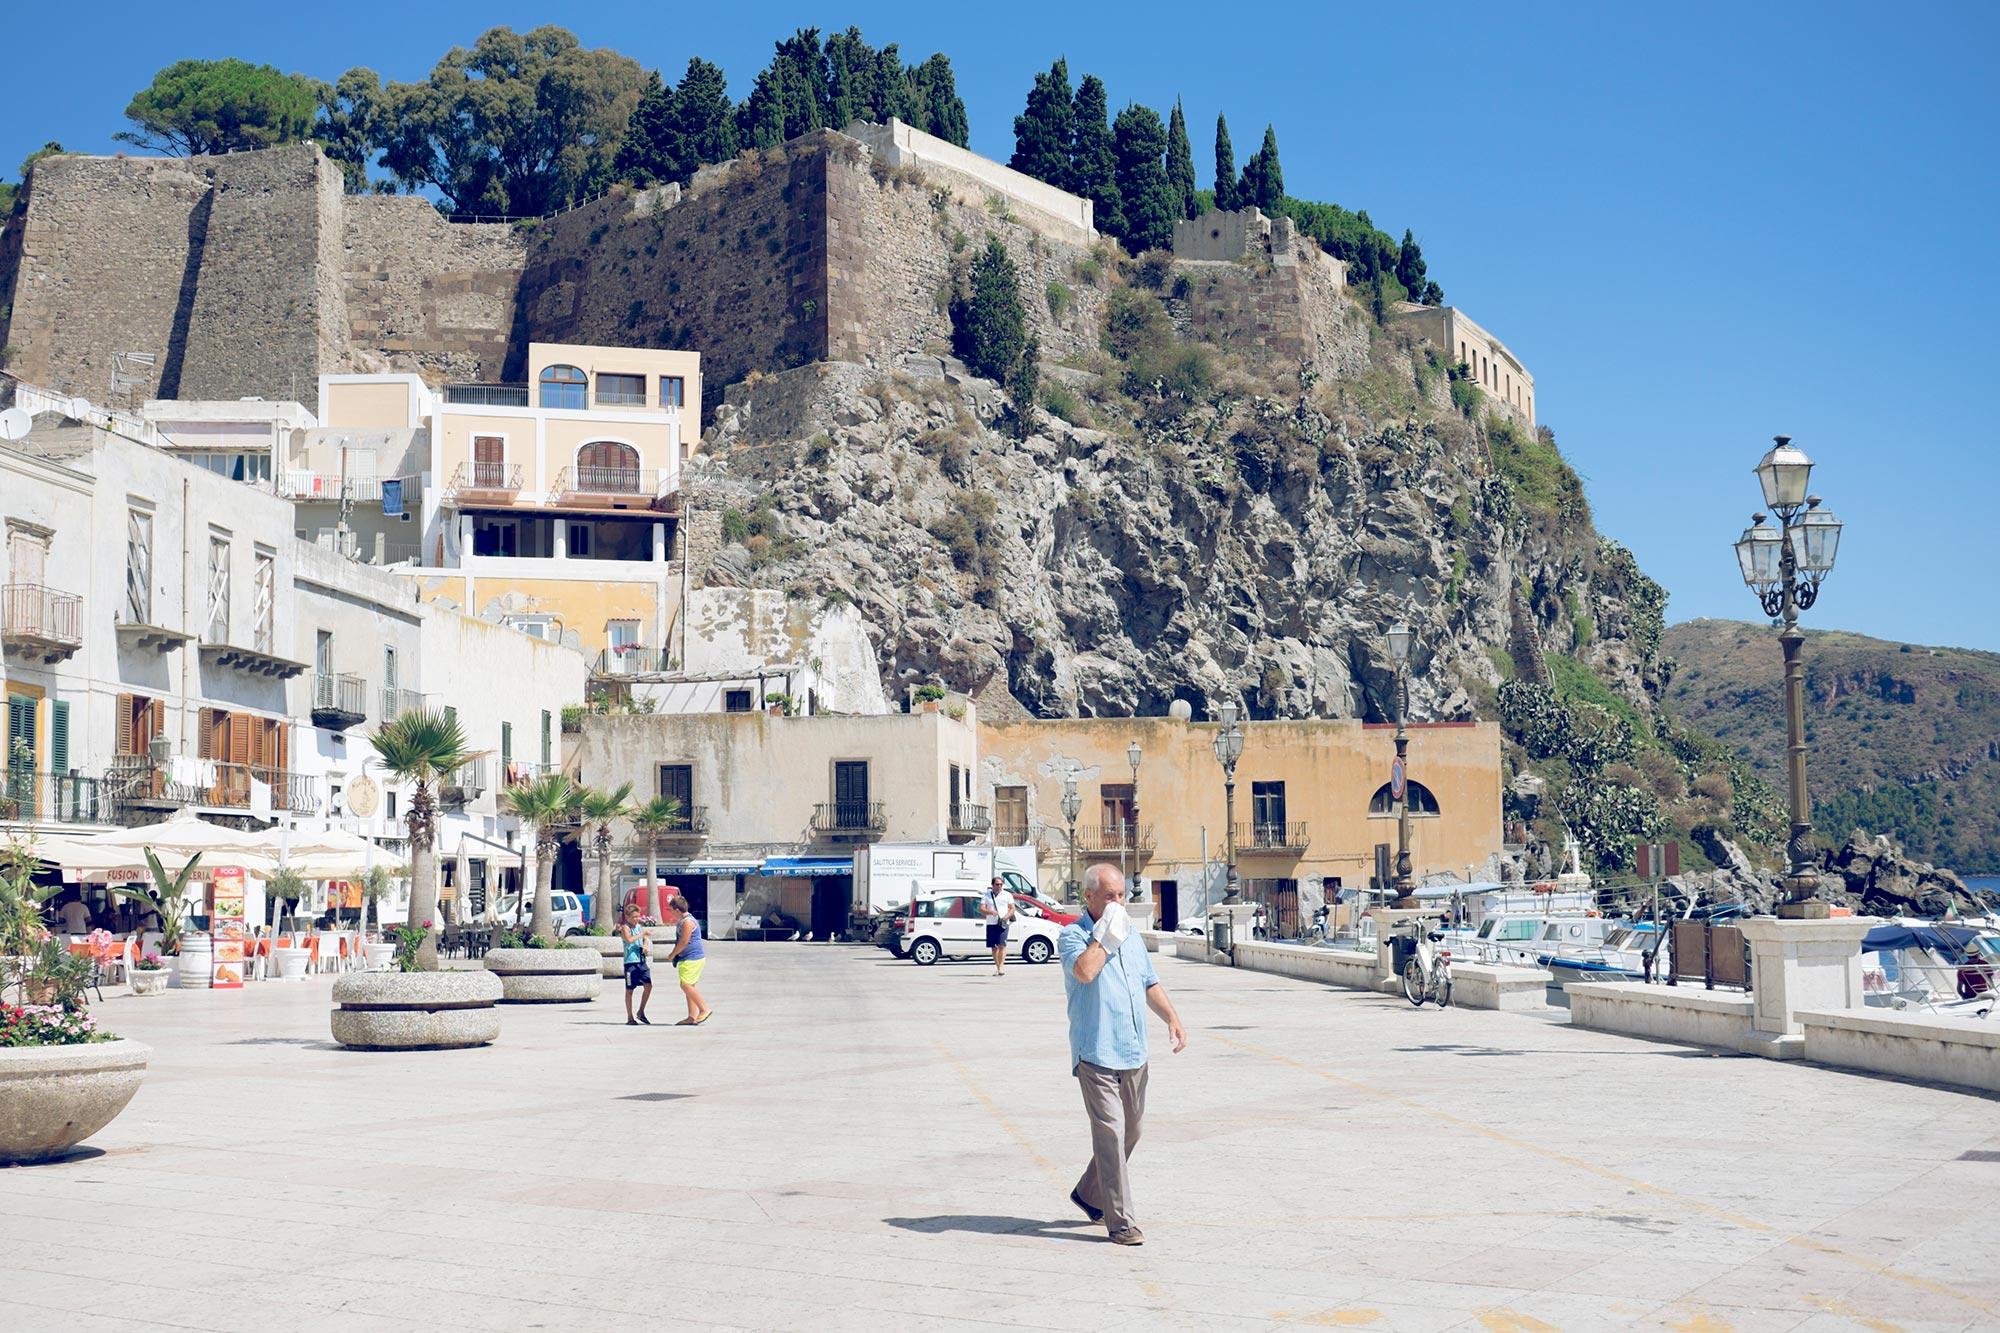 italy-sicilia-eolie-italy-sicilia-eolie-lipari-marina-corta-walls